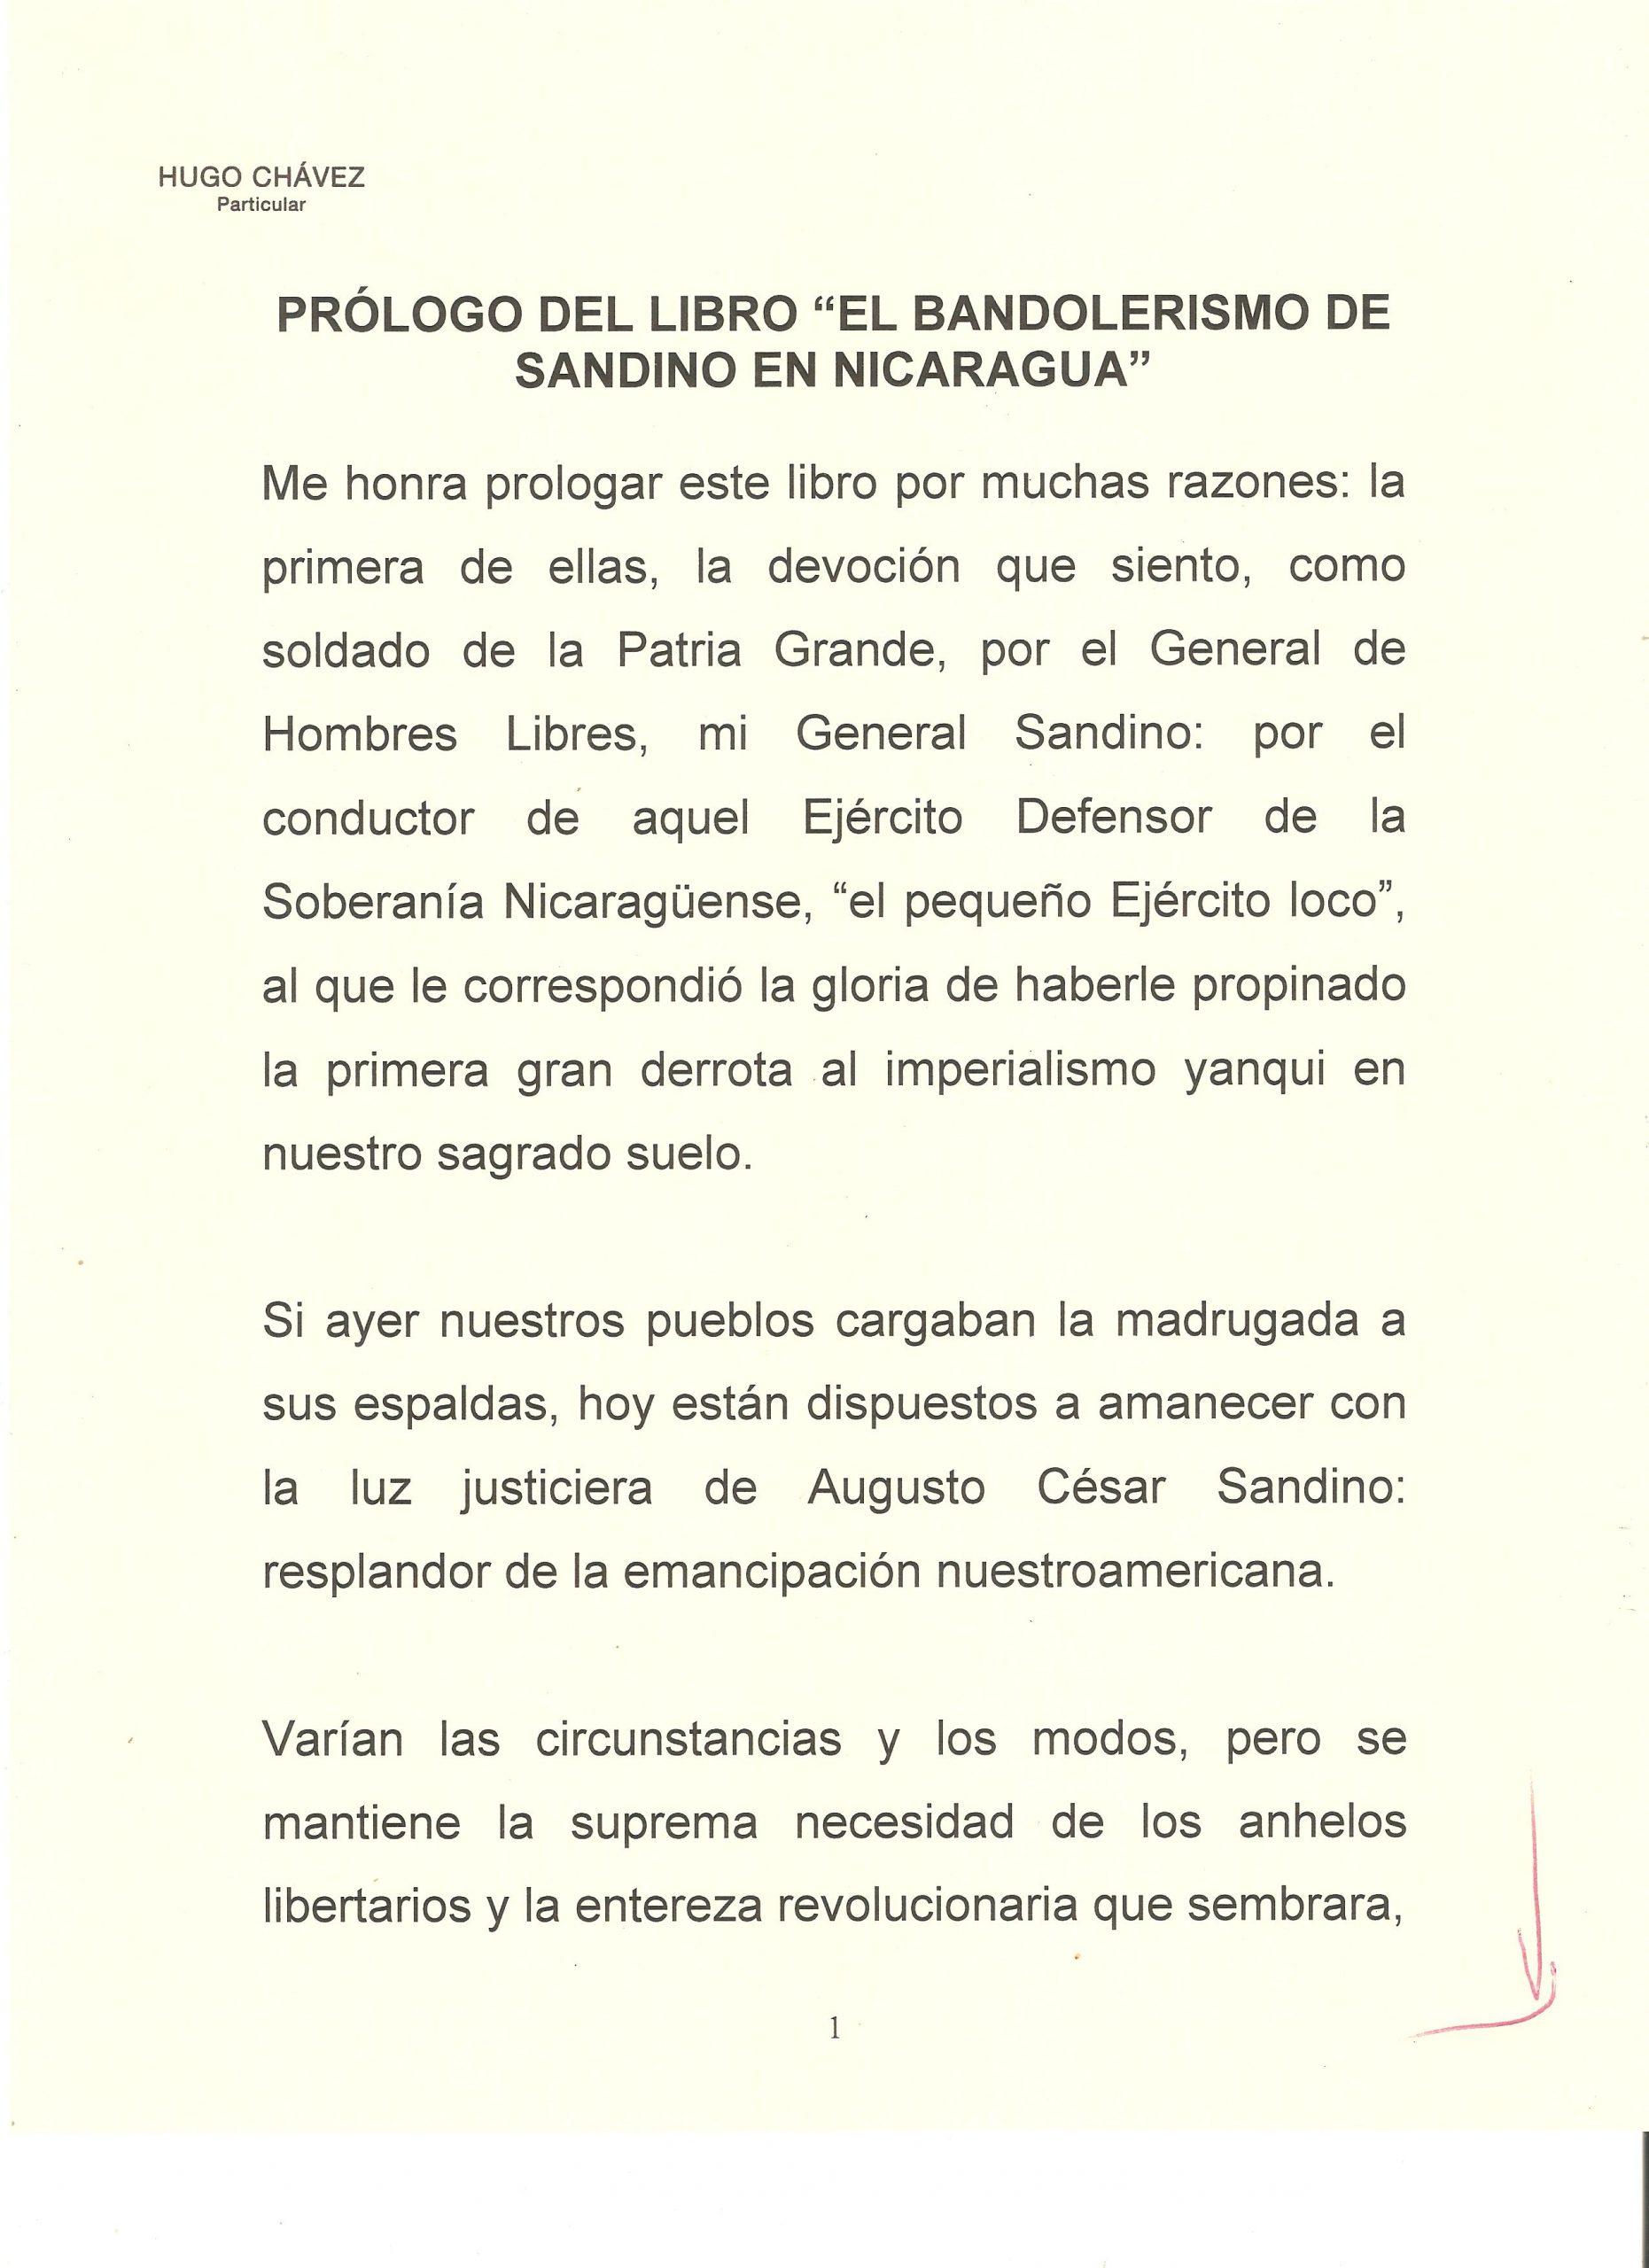 PROLOGO DE HUGO CHAVEZ A WALTER 1